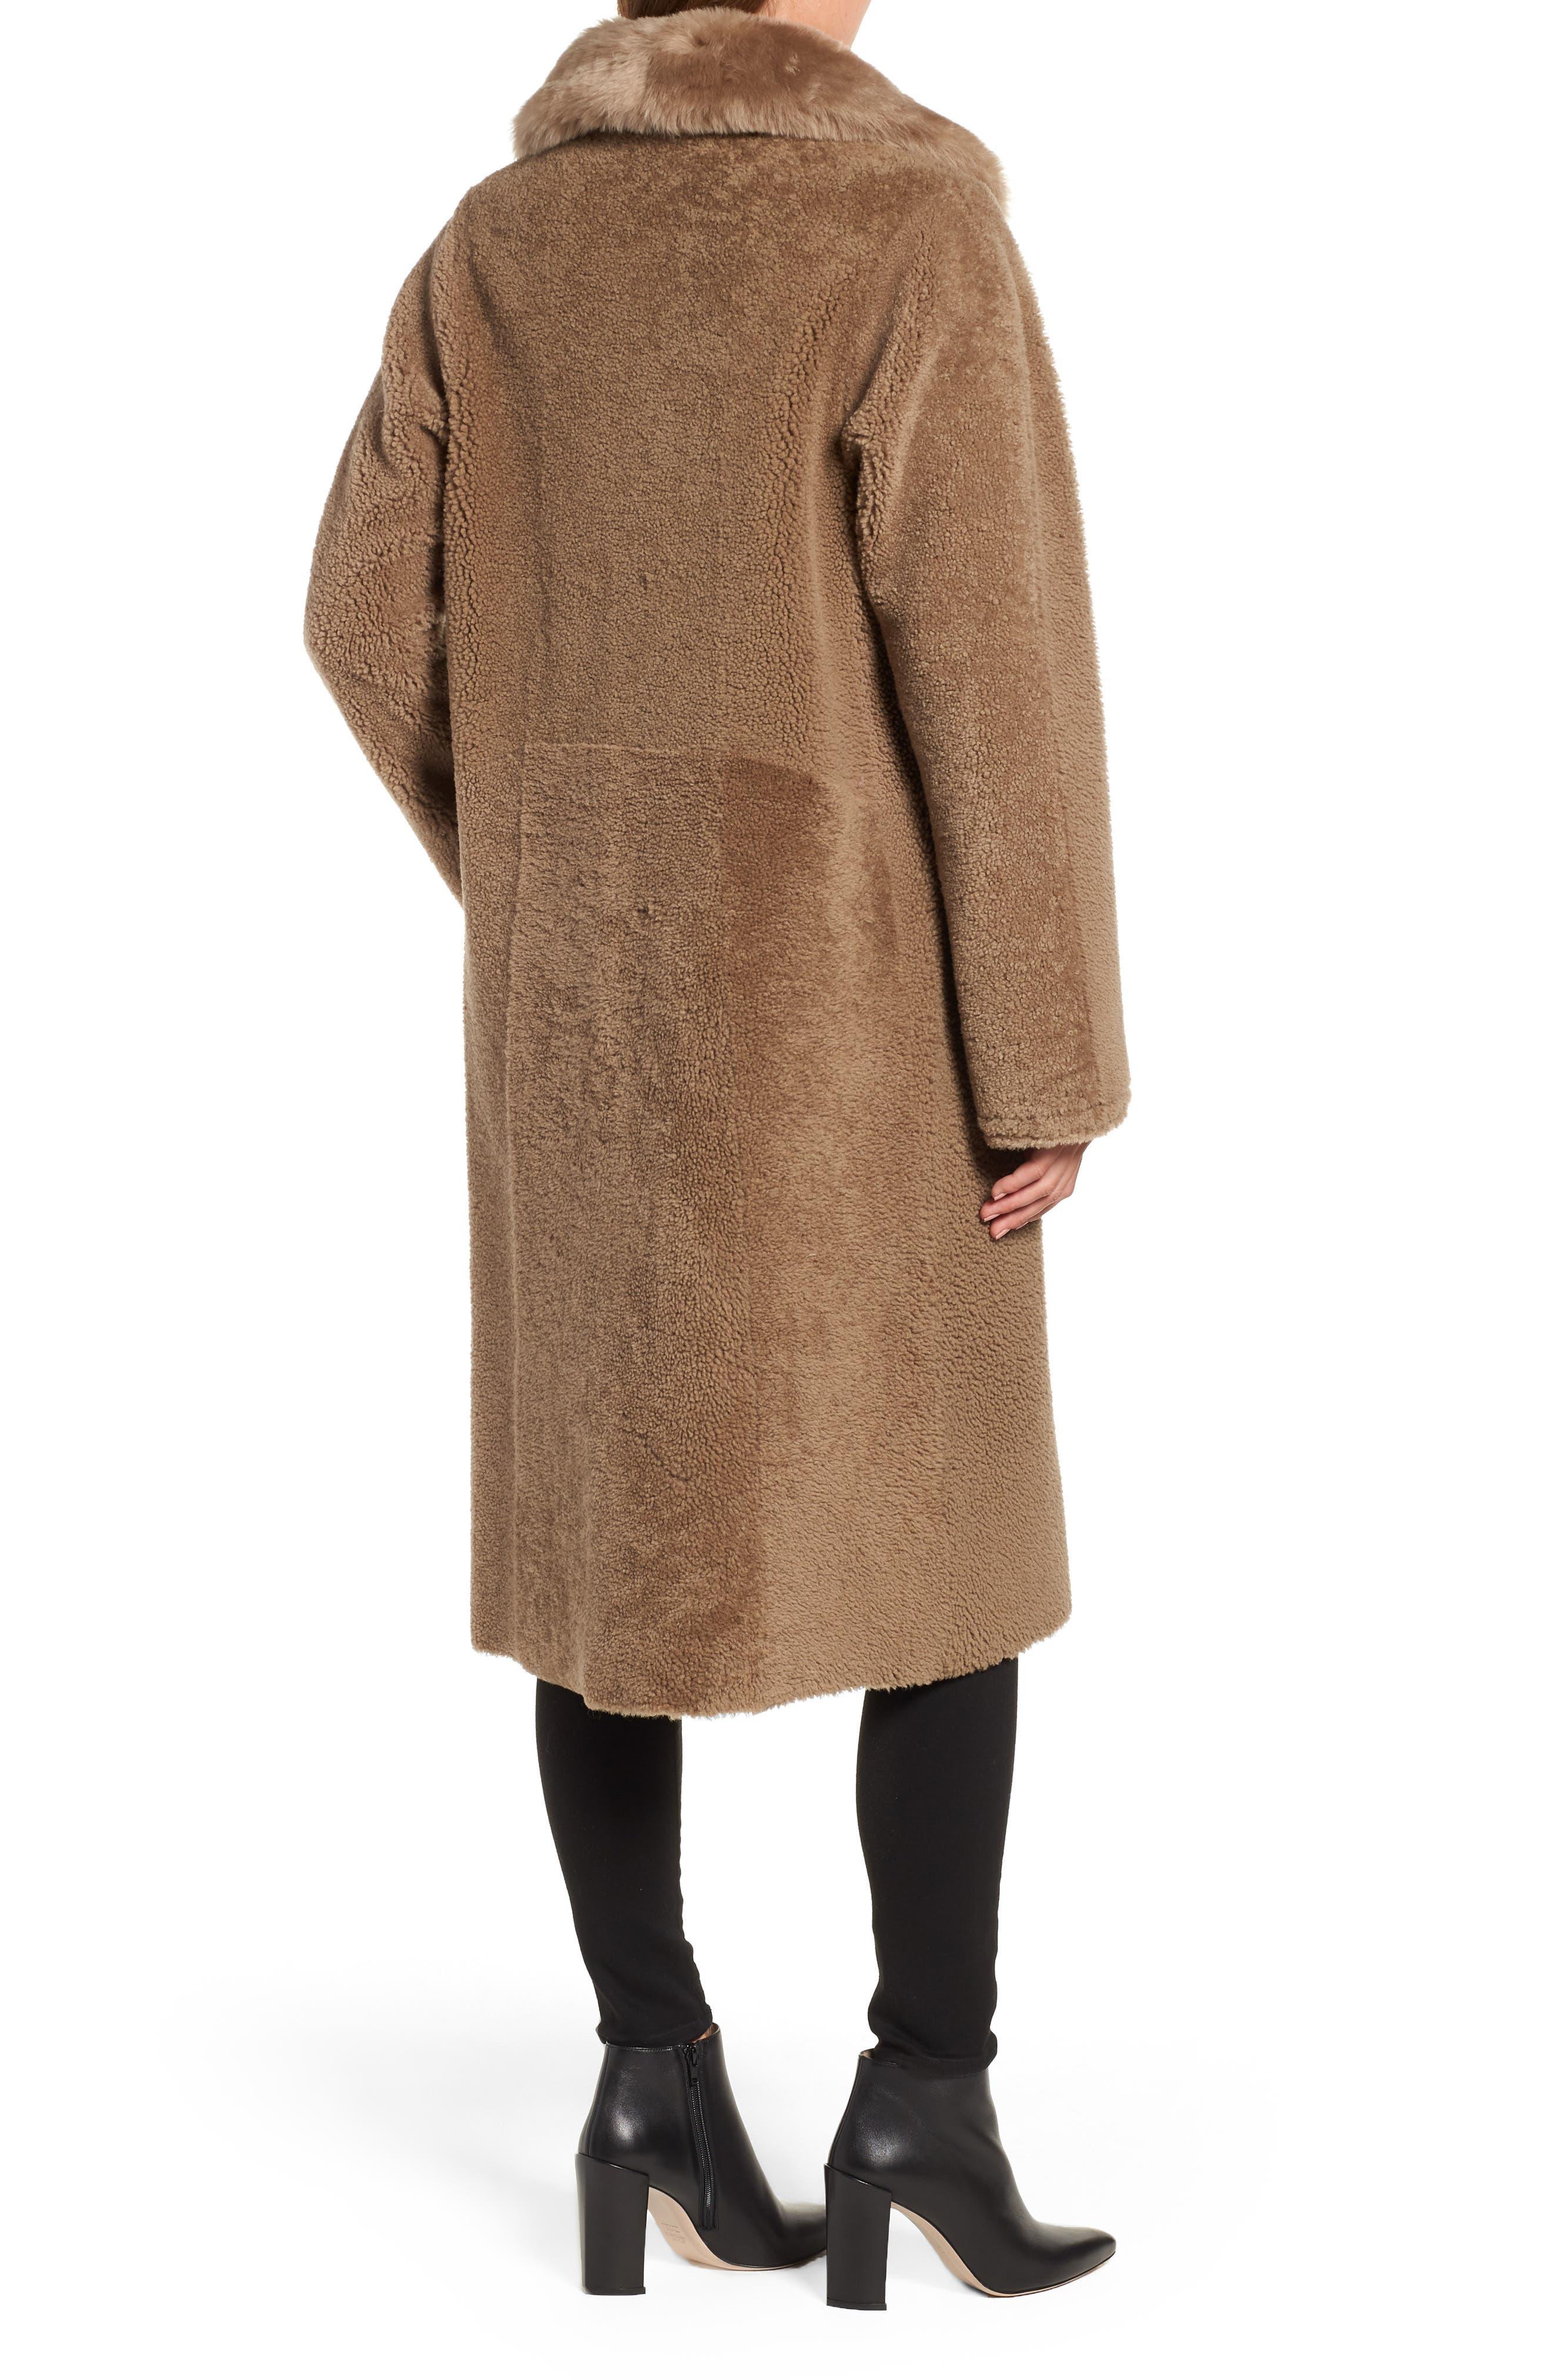 HISO,                             Genuine Merino Shearling Coat,                             Alternate thumbnail 2, color,                             250